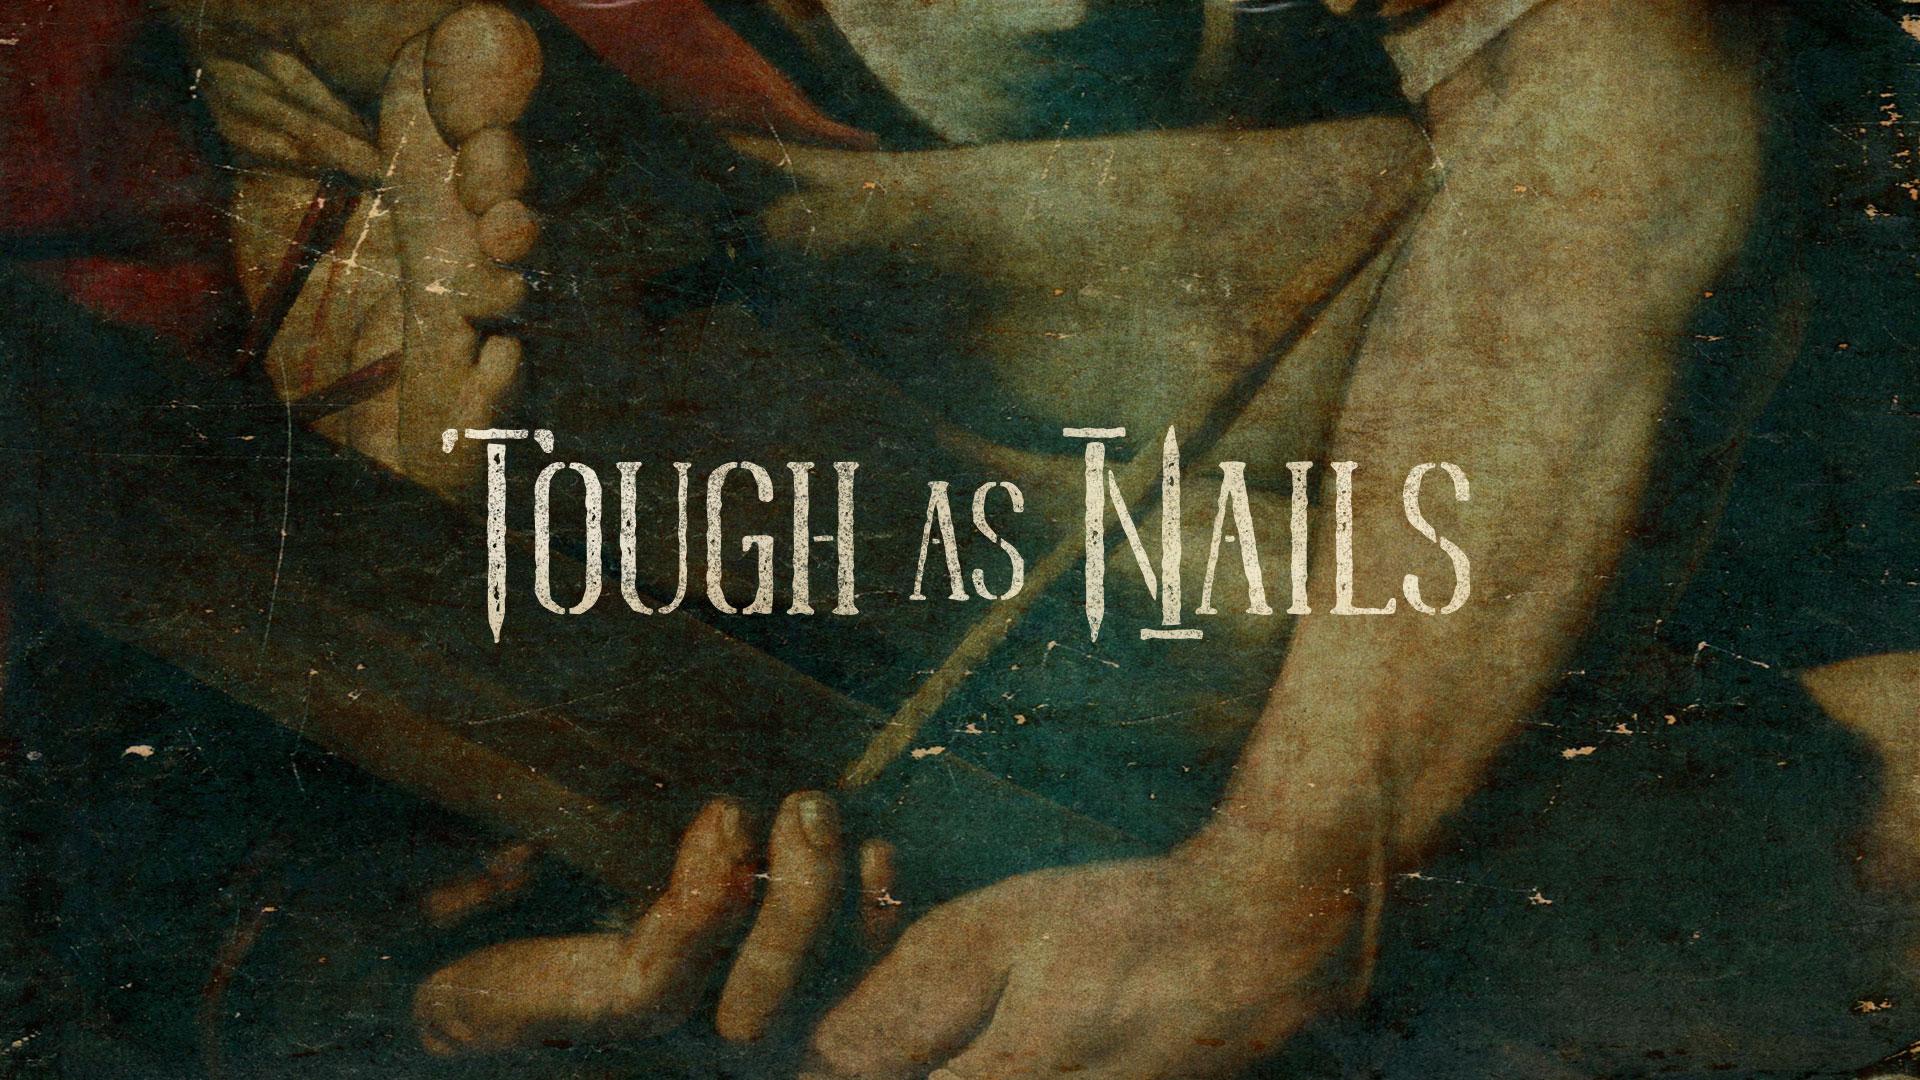 TOUGH-AS-NAILS_TITLE.jpg